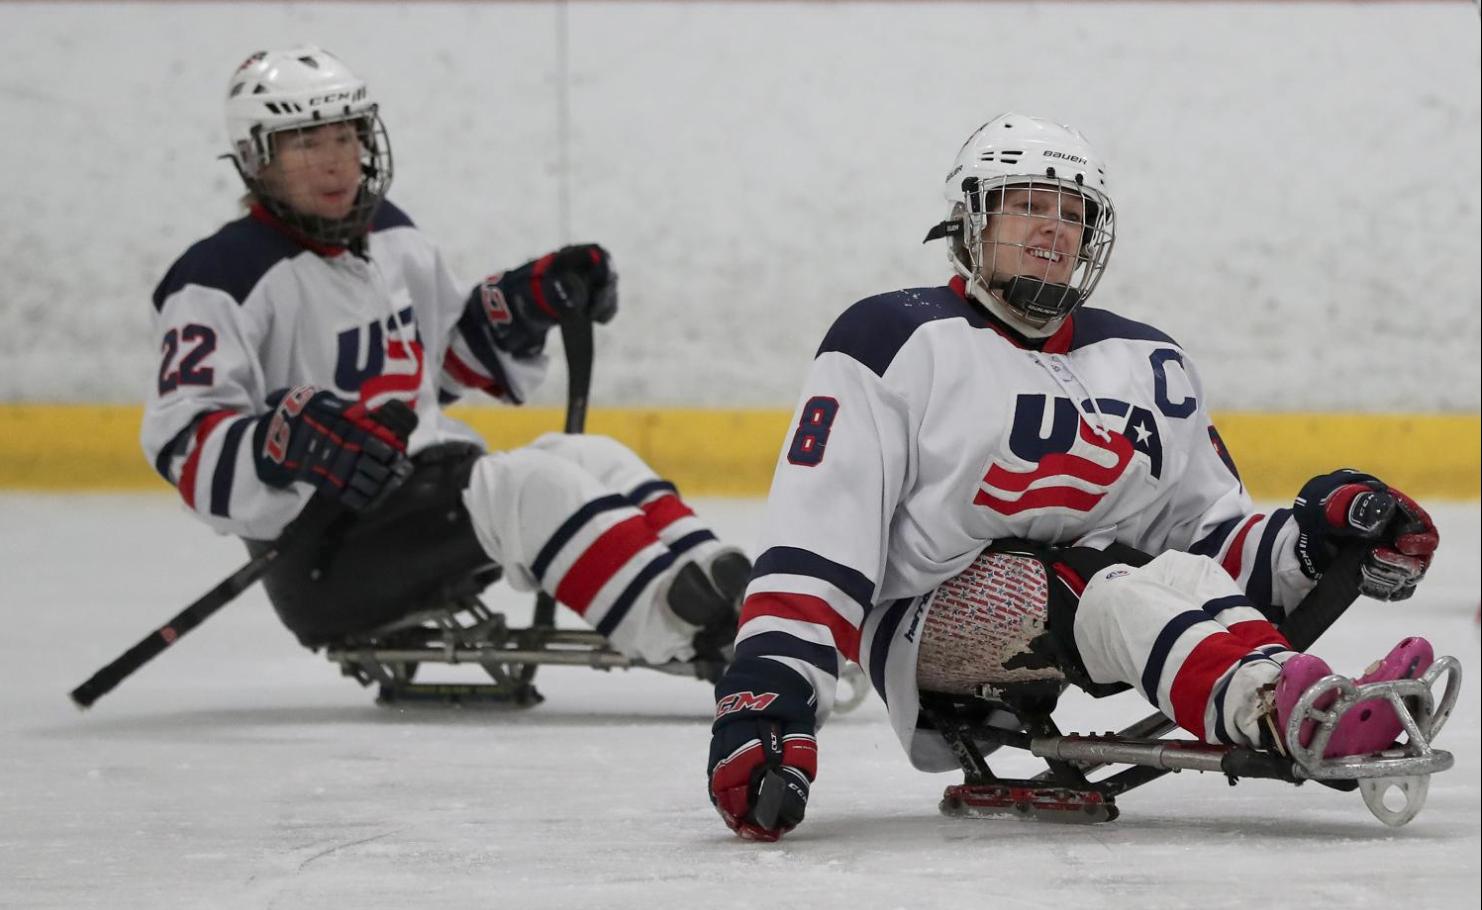 U.S. Women s Development Sled Hockey Team Closes Series vs. Canada with 2-1  Win ba6456082